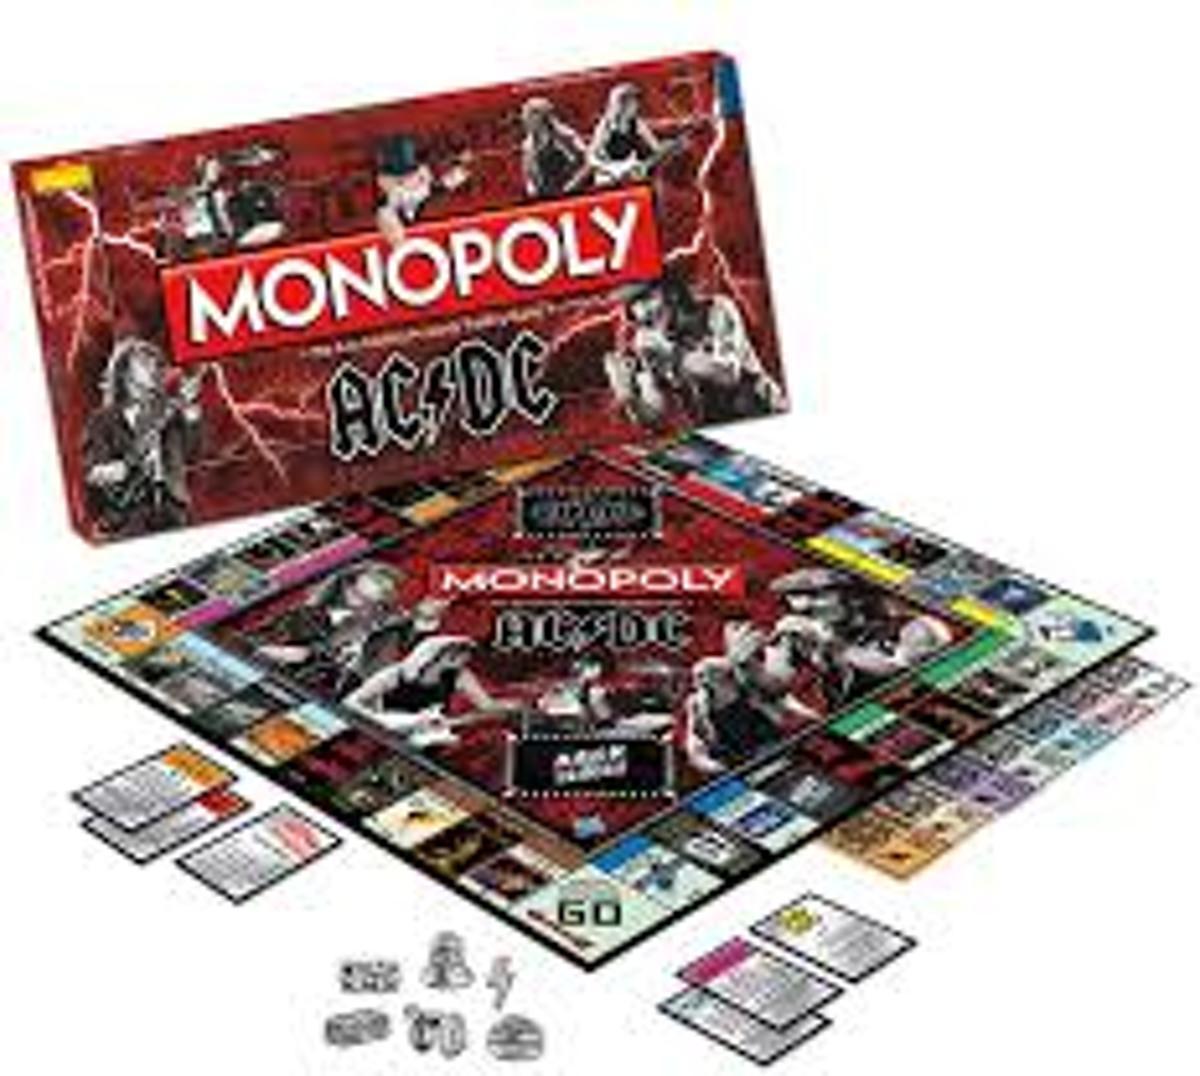 Monopoly ACDC - Engelstalig Bordspel